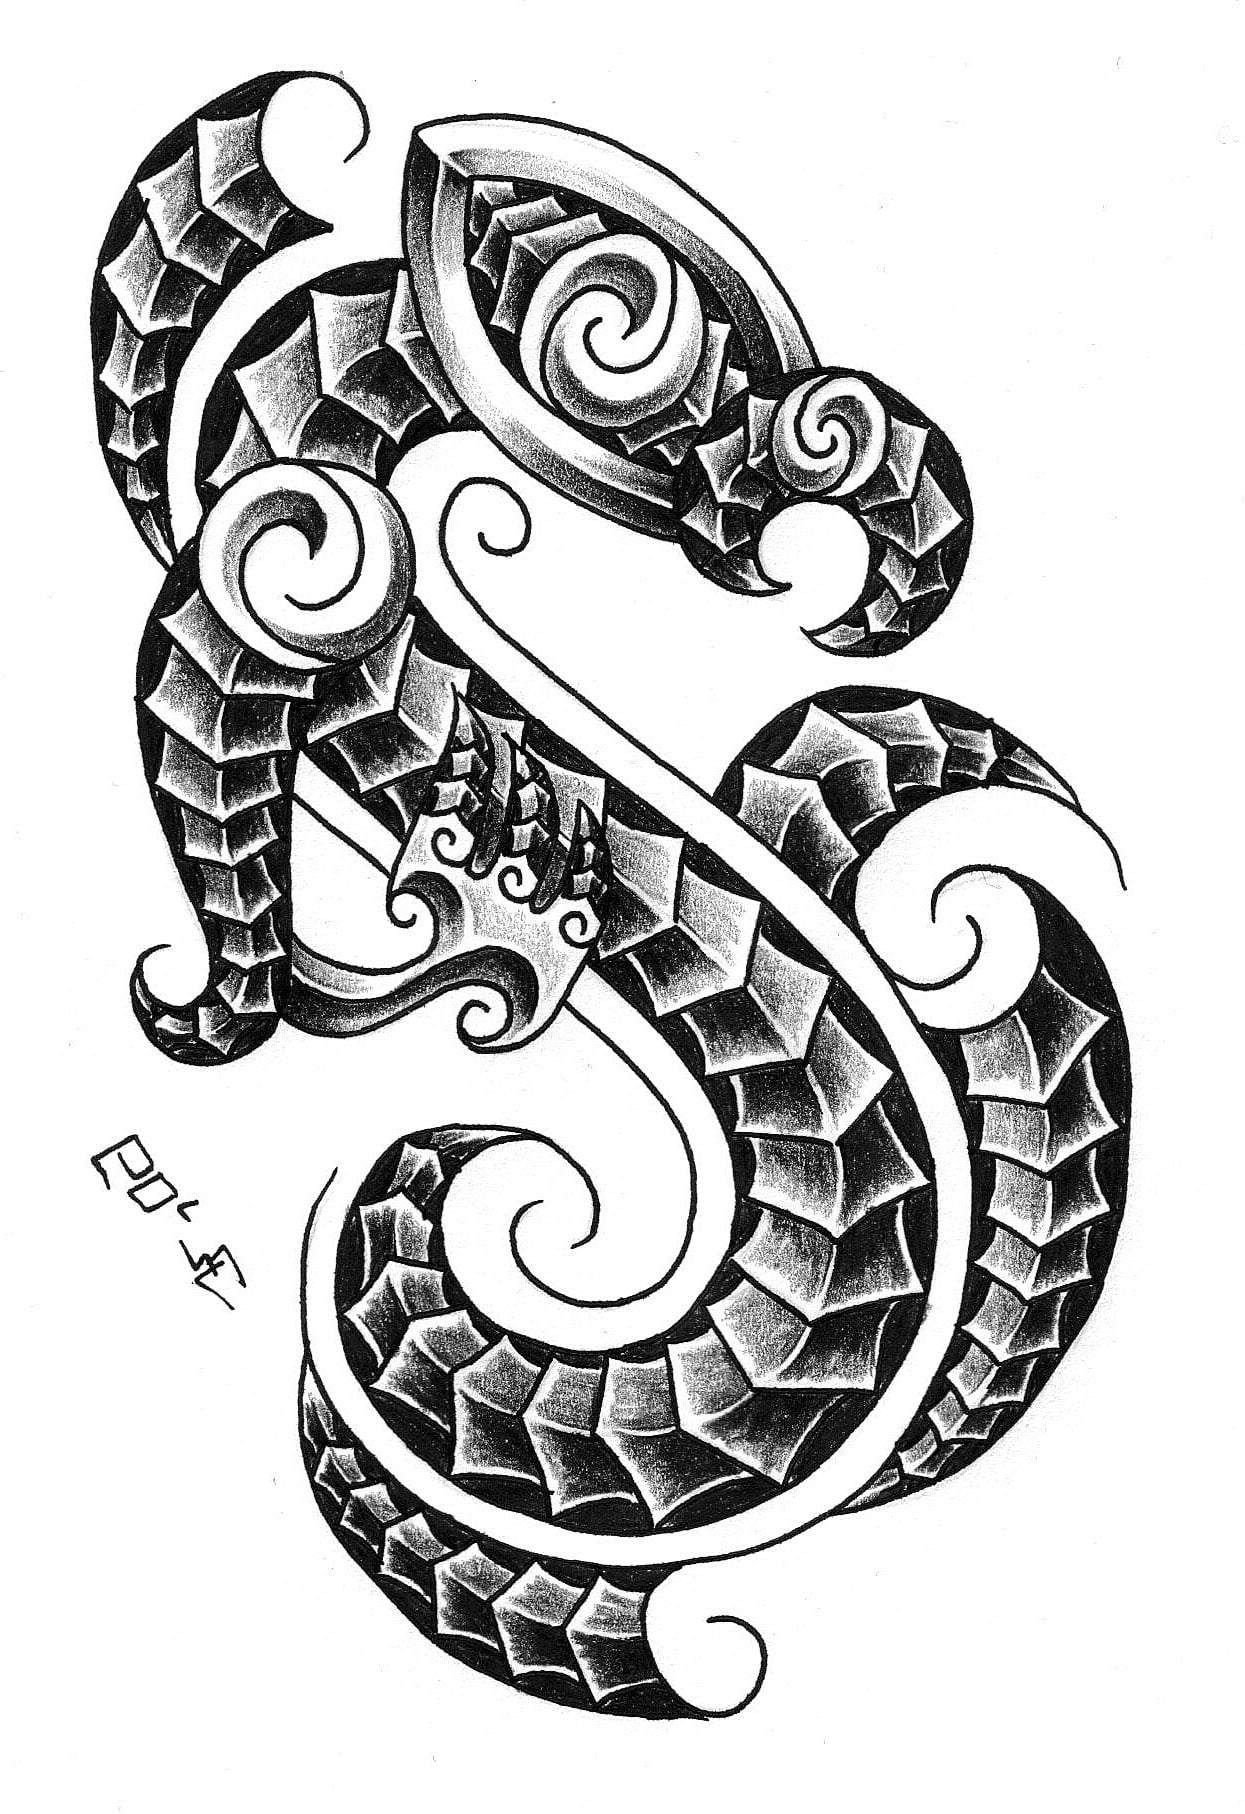 maori tribal tattoos meanings cool tattoos bonbaden. Black Bedroom Furniture Sets. Home Design Ideas